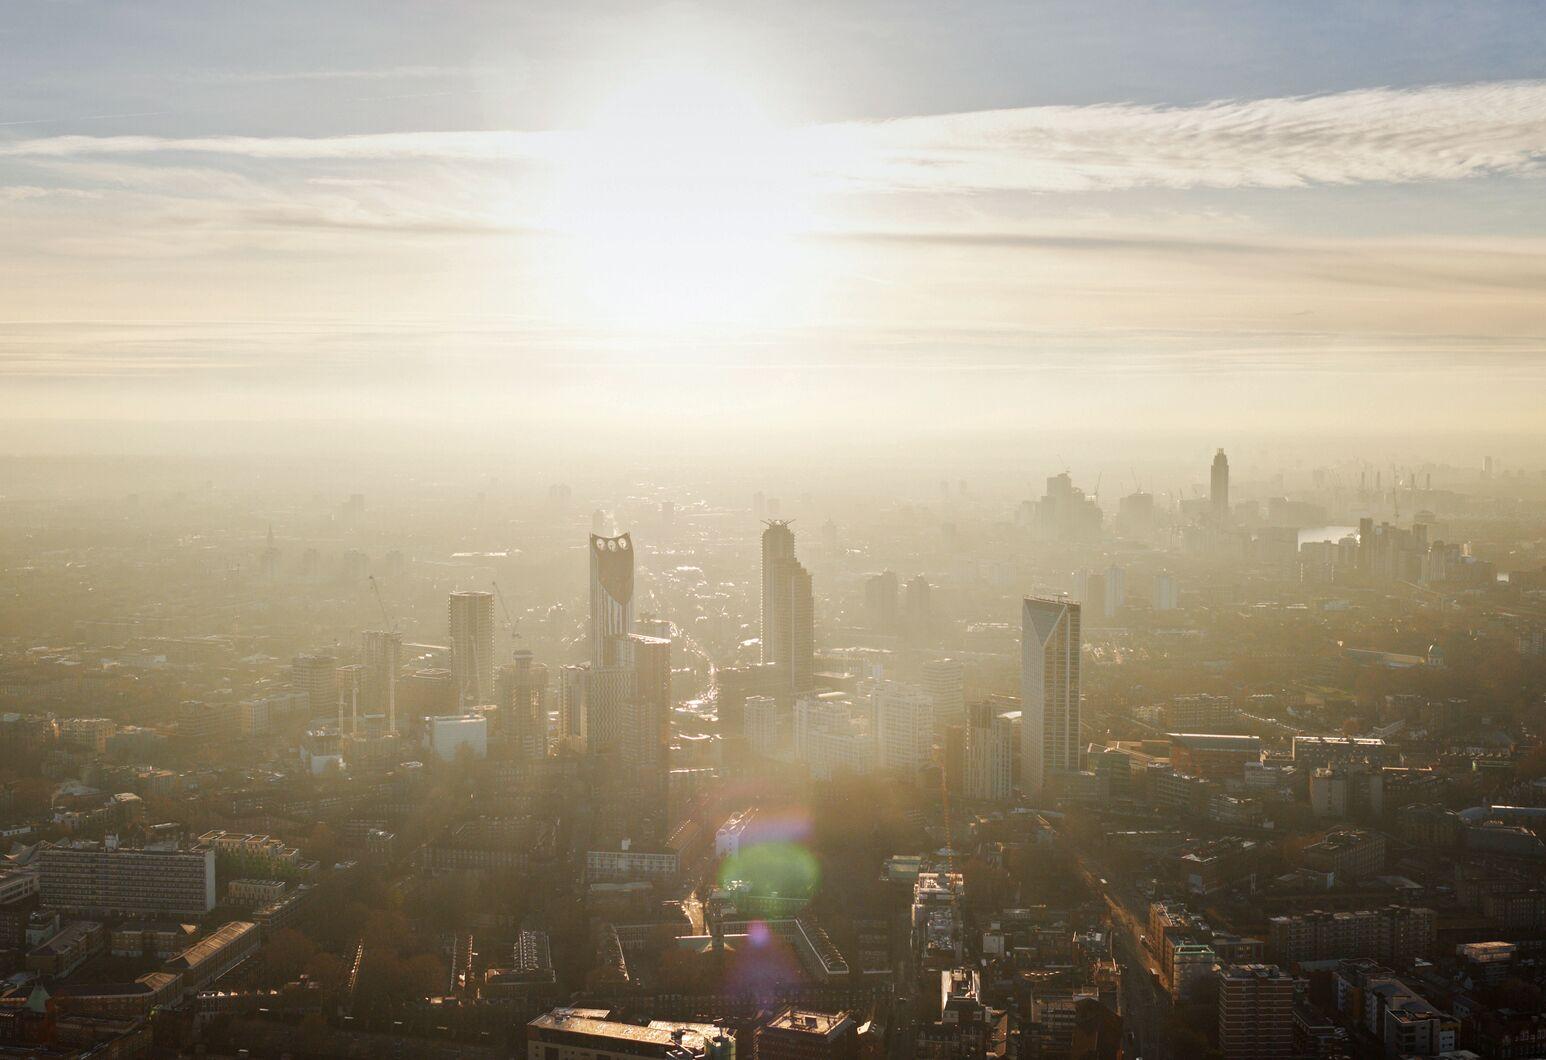 Smog rests over a city